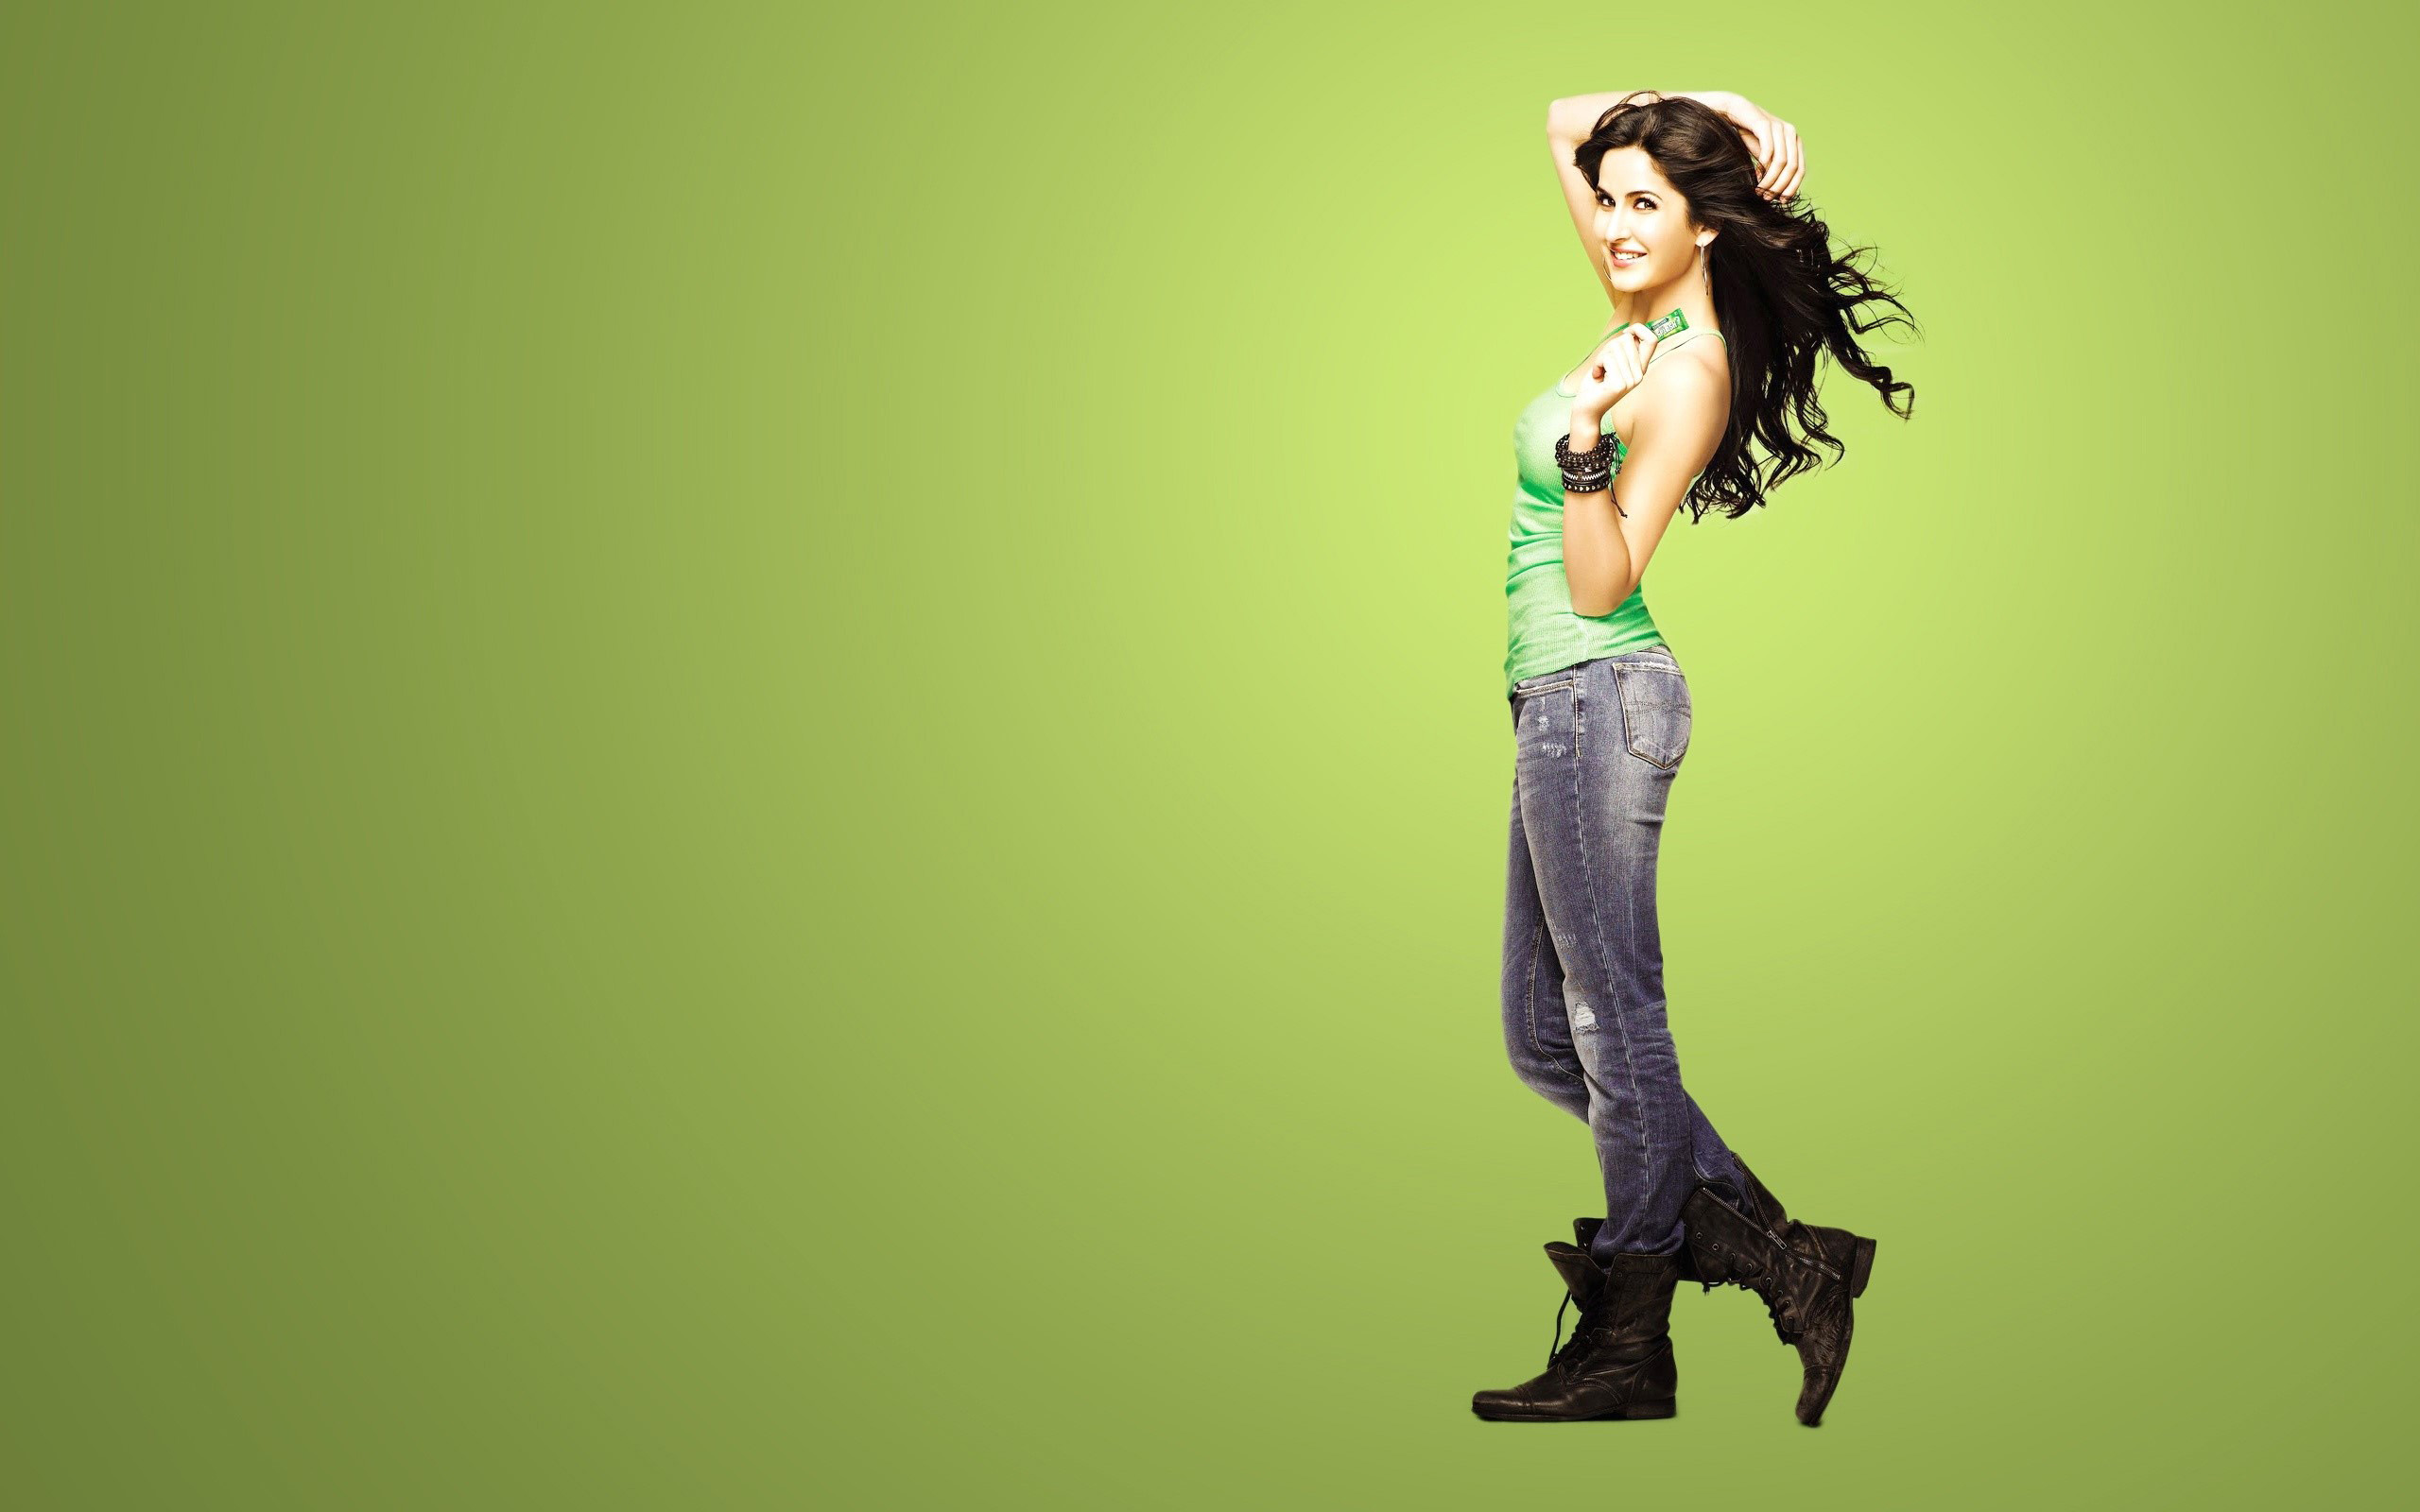 Wallpaper Bollywood actress Katrina Kaif